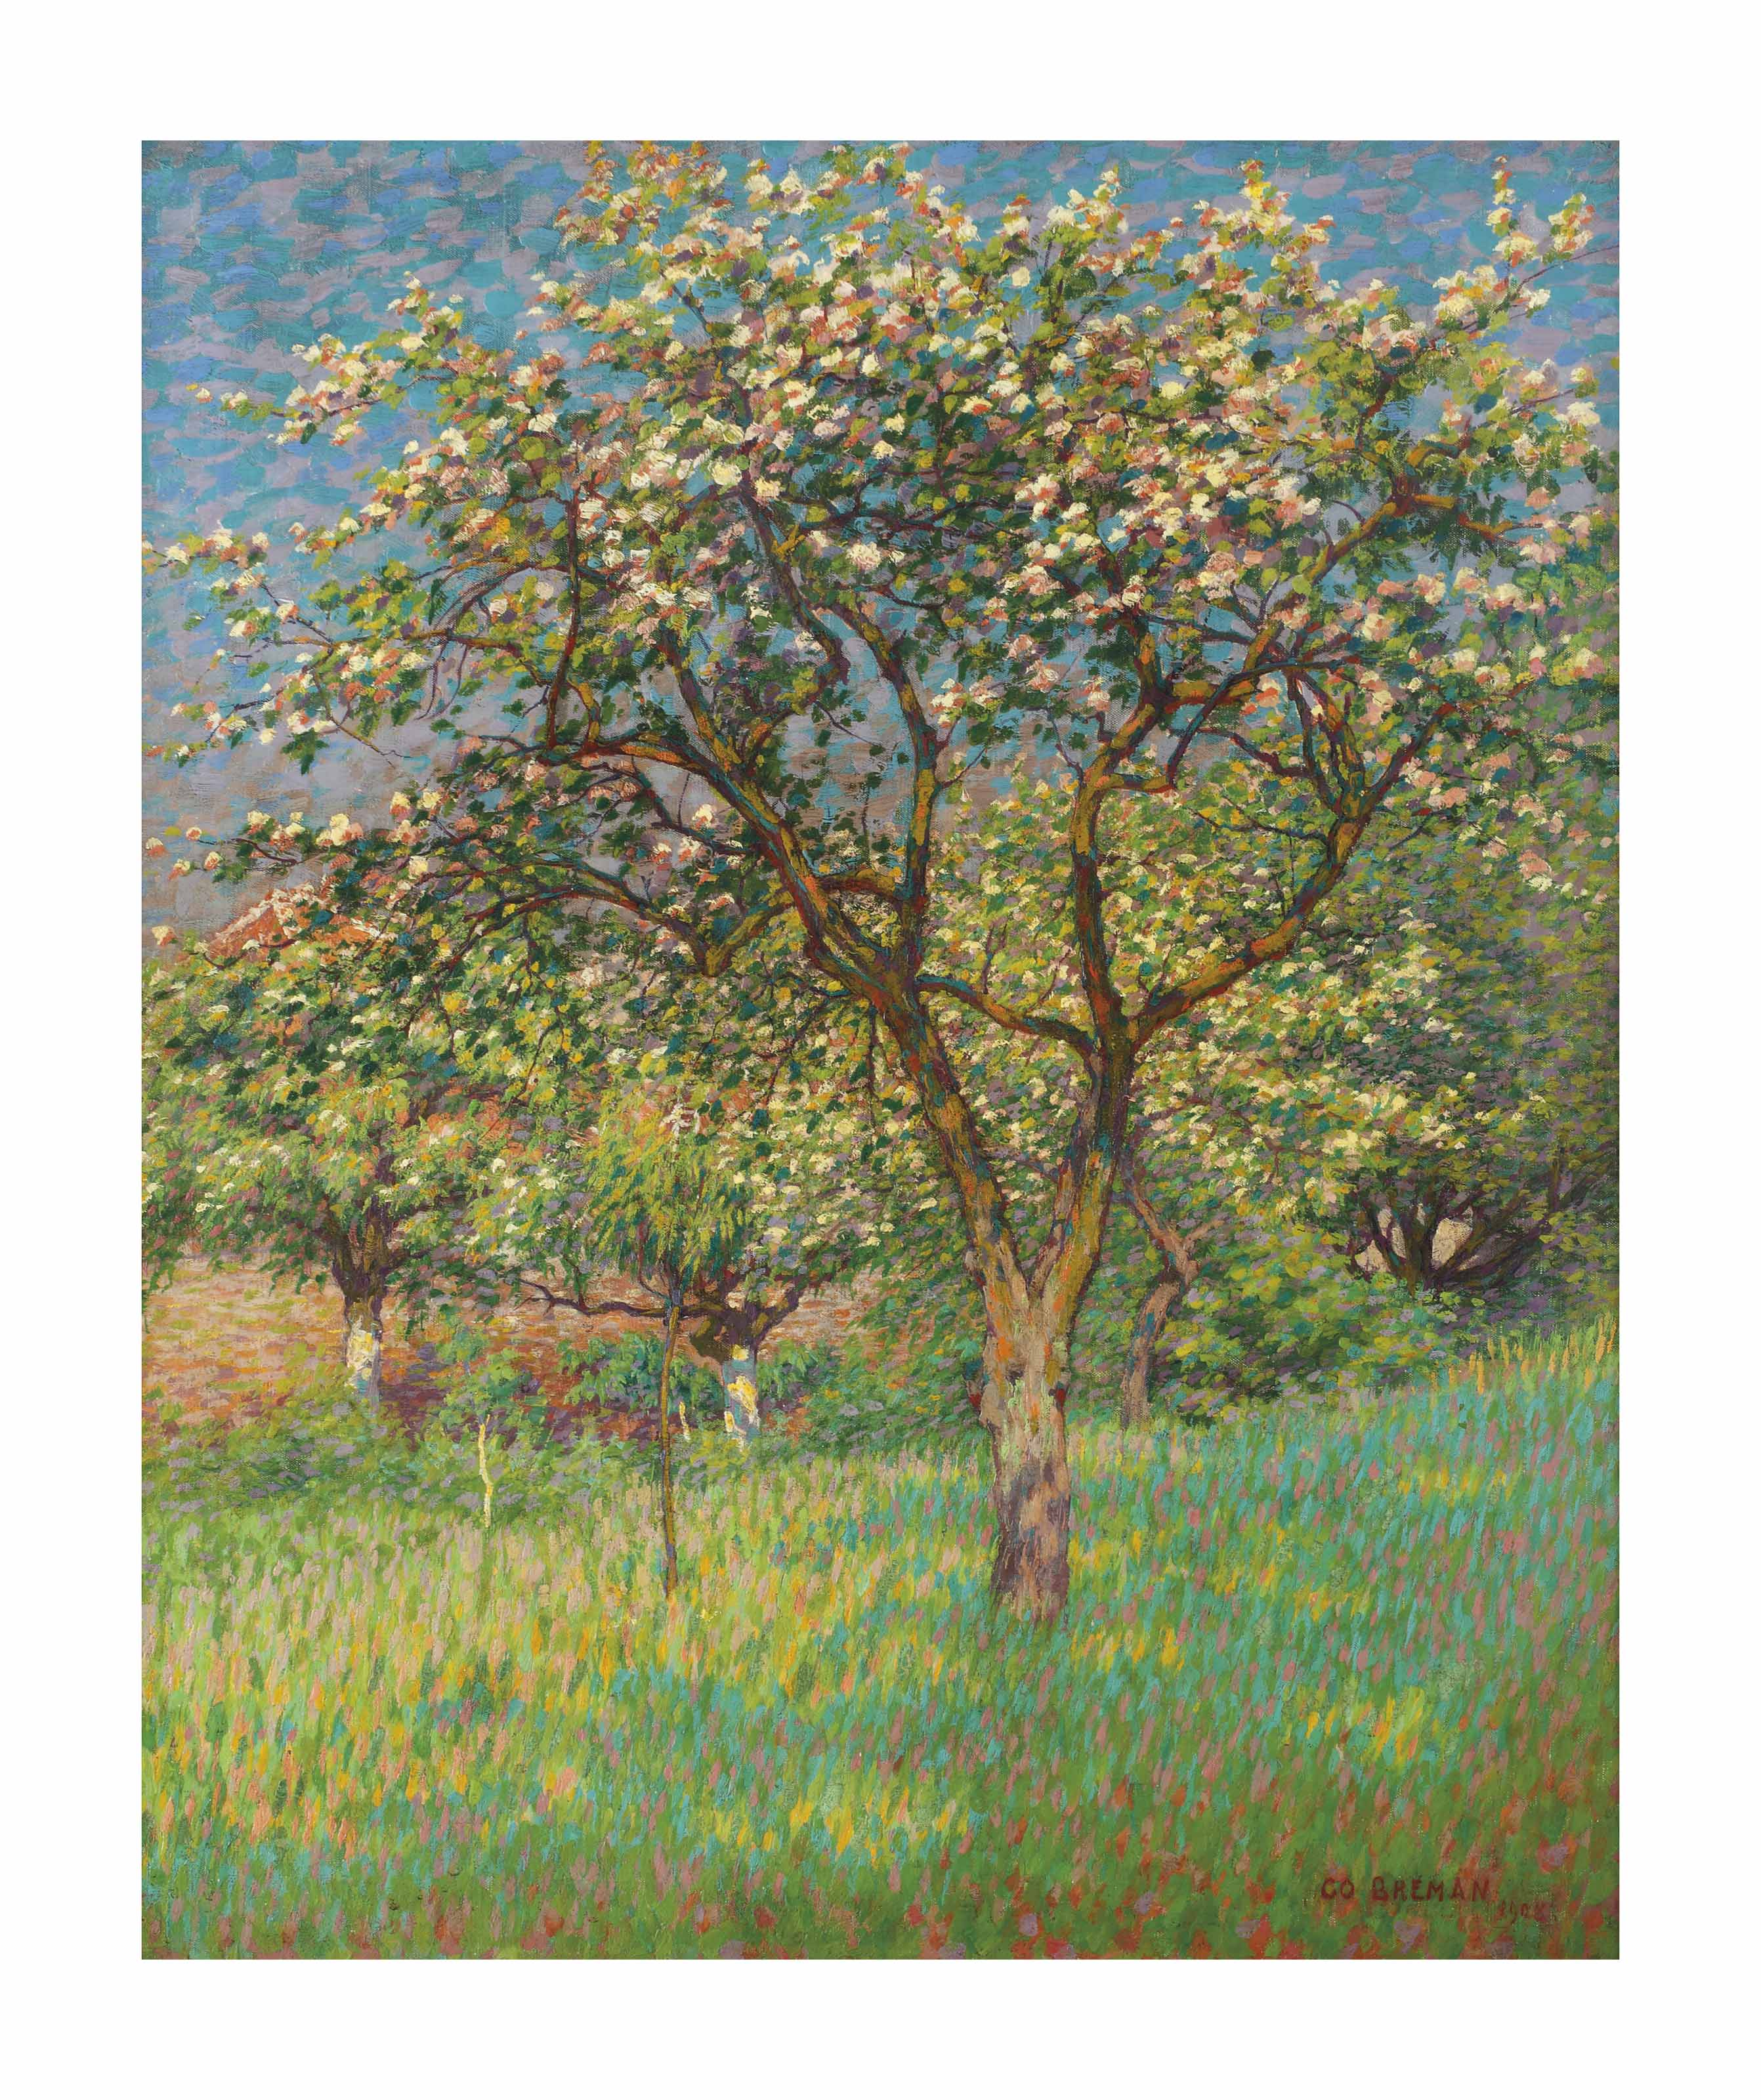 Blossoming trees in Het Gooi